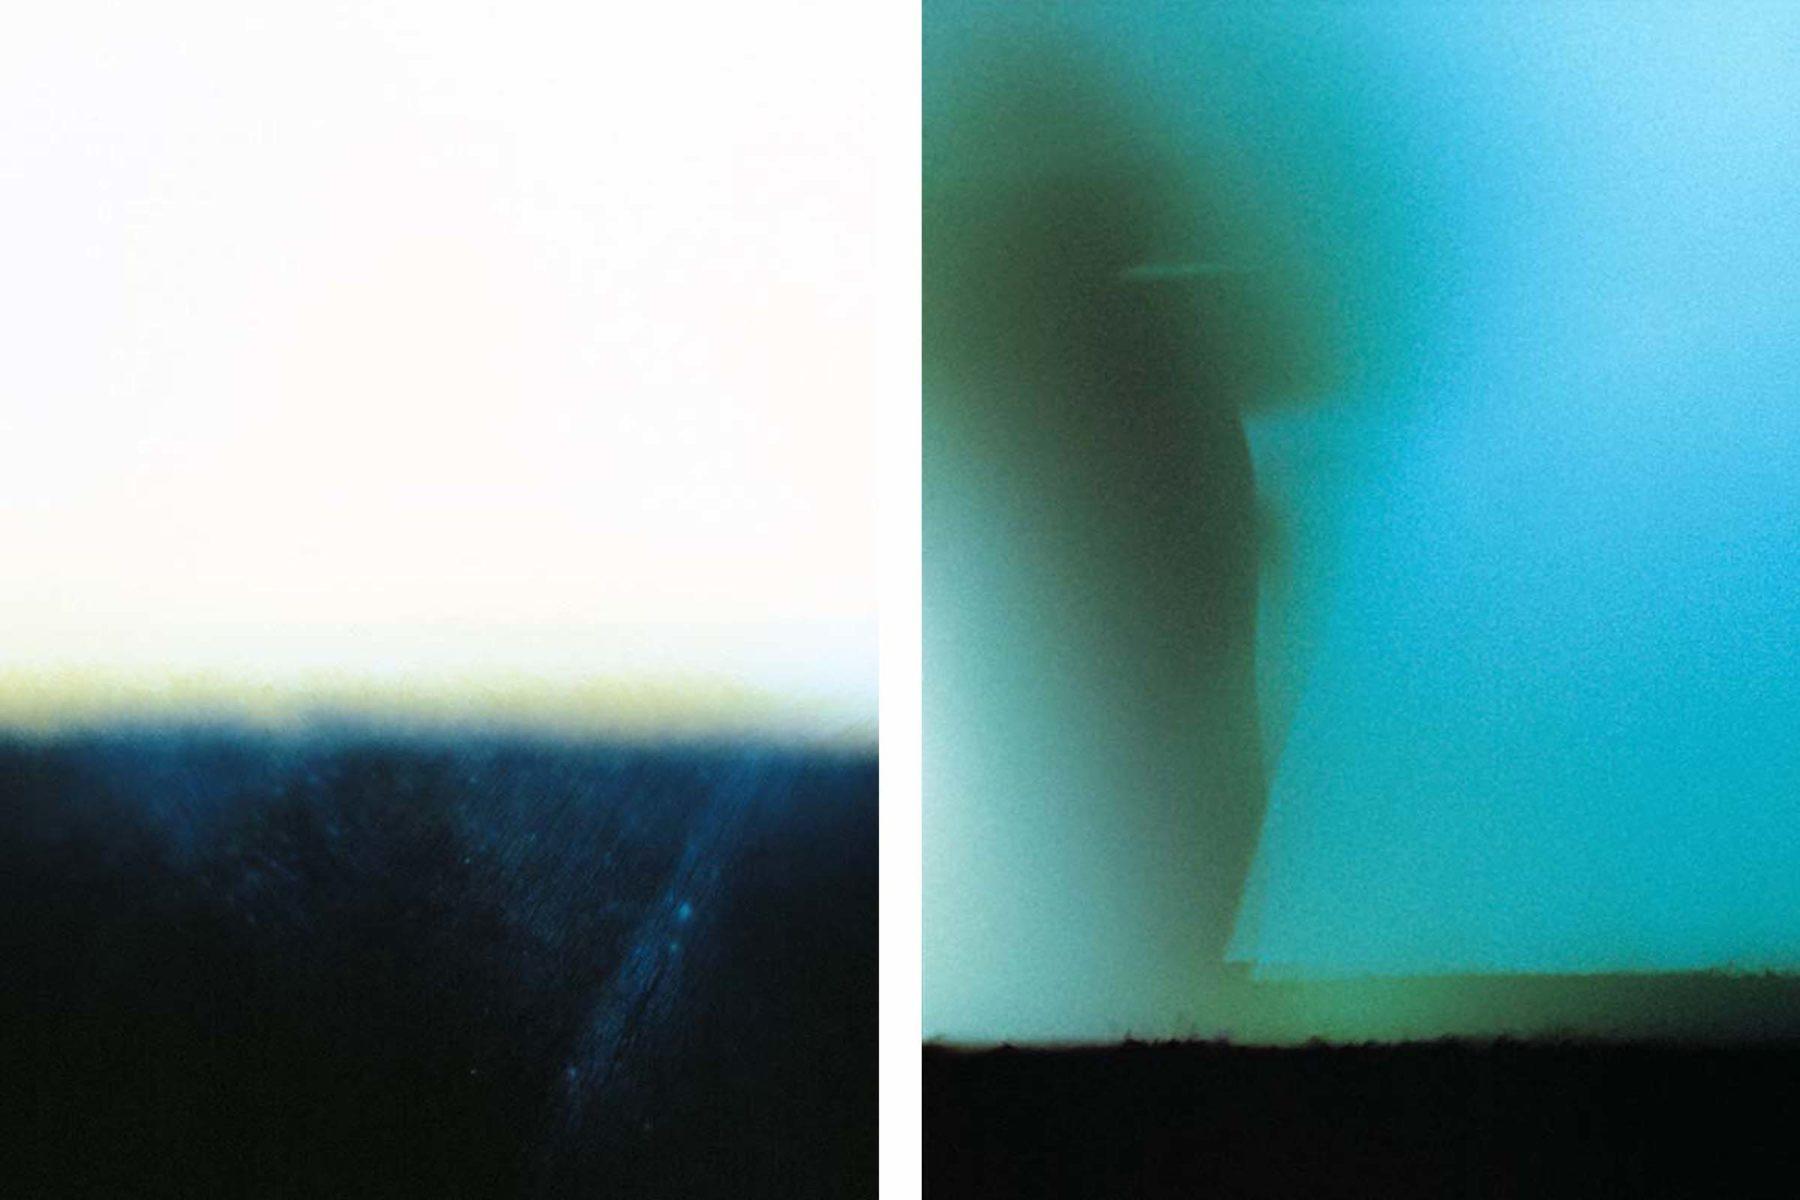 Paolo Casonato, TrashScapes, 2007, inkjet on fine art paper, 45 x 30 cm each